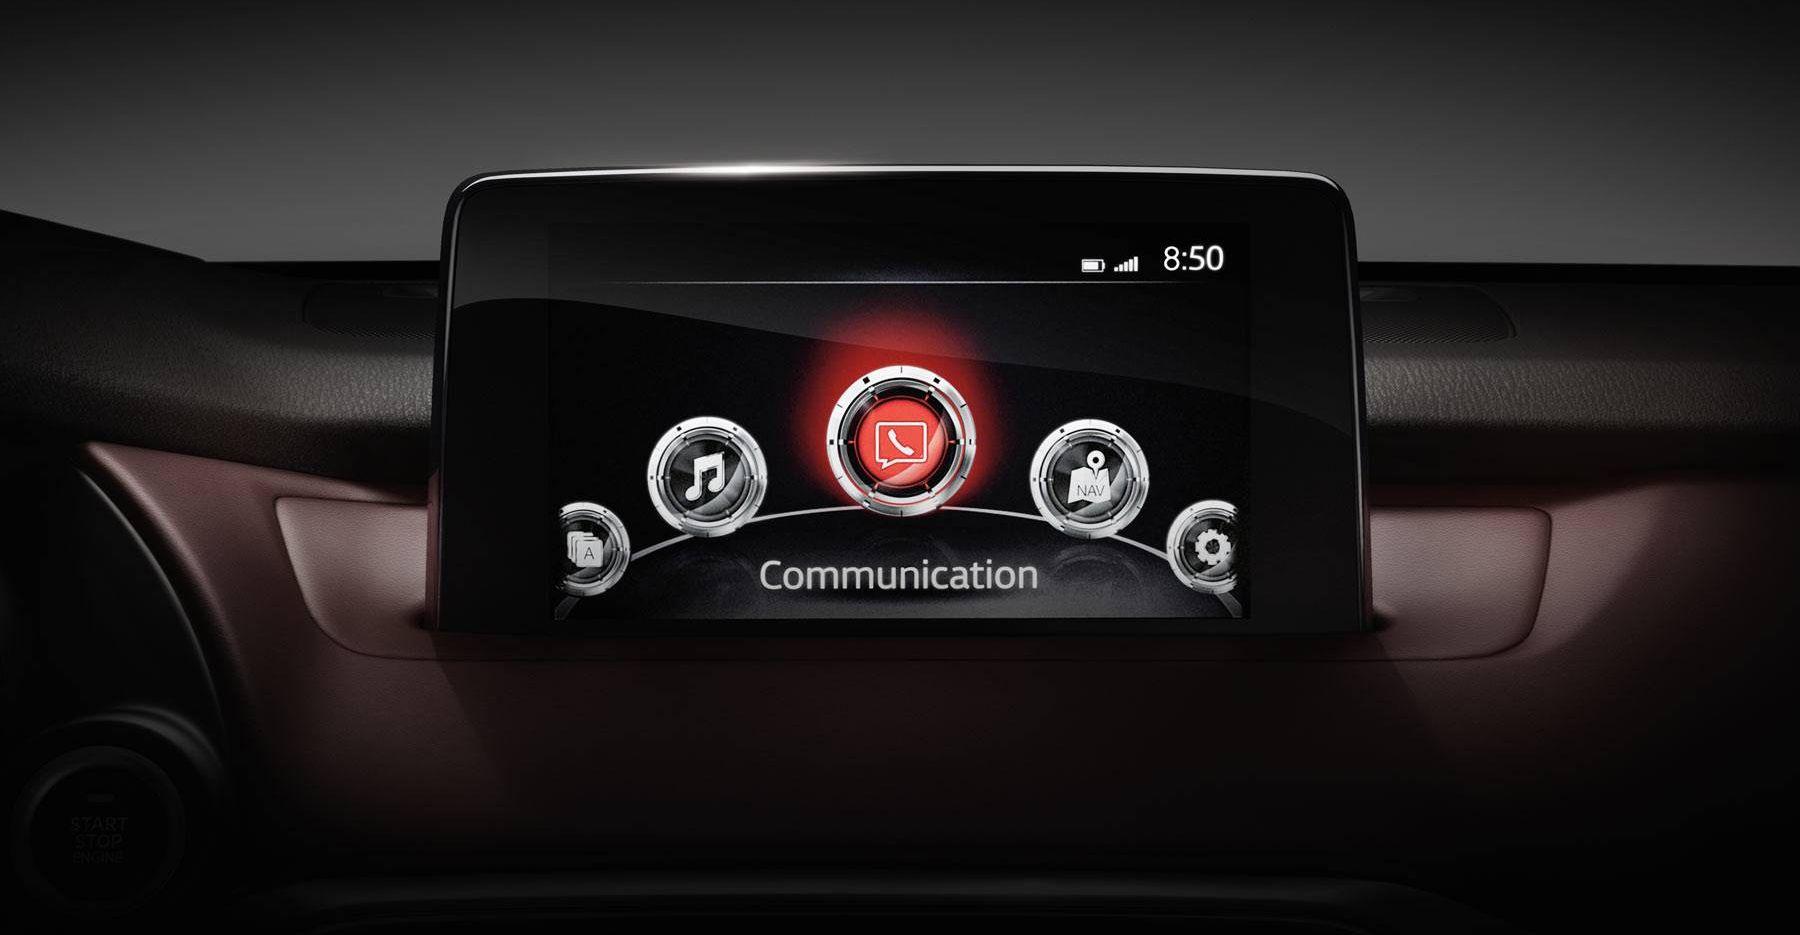 Mazda CX-9 Infotainment System